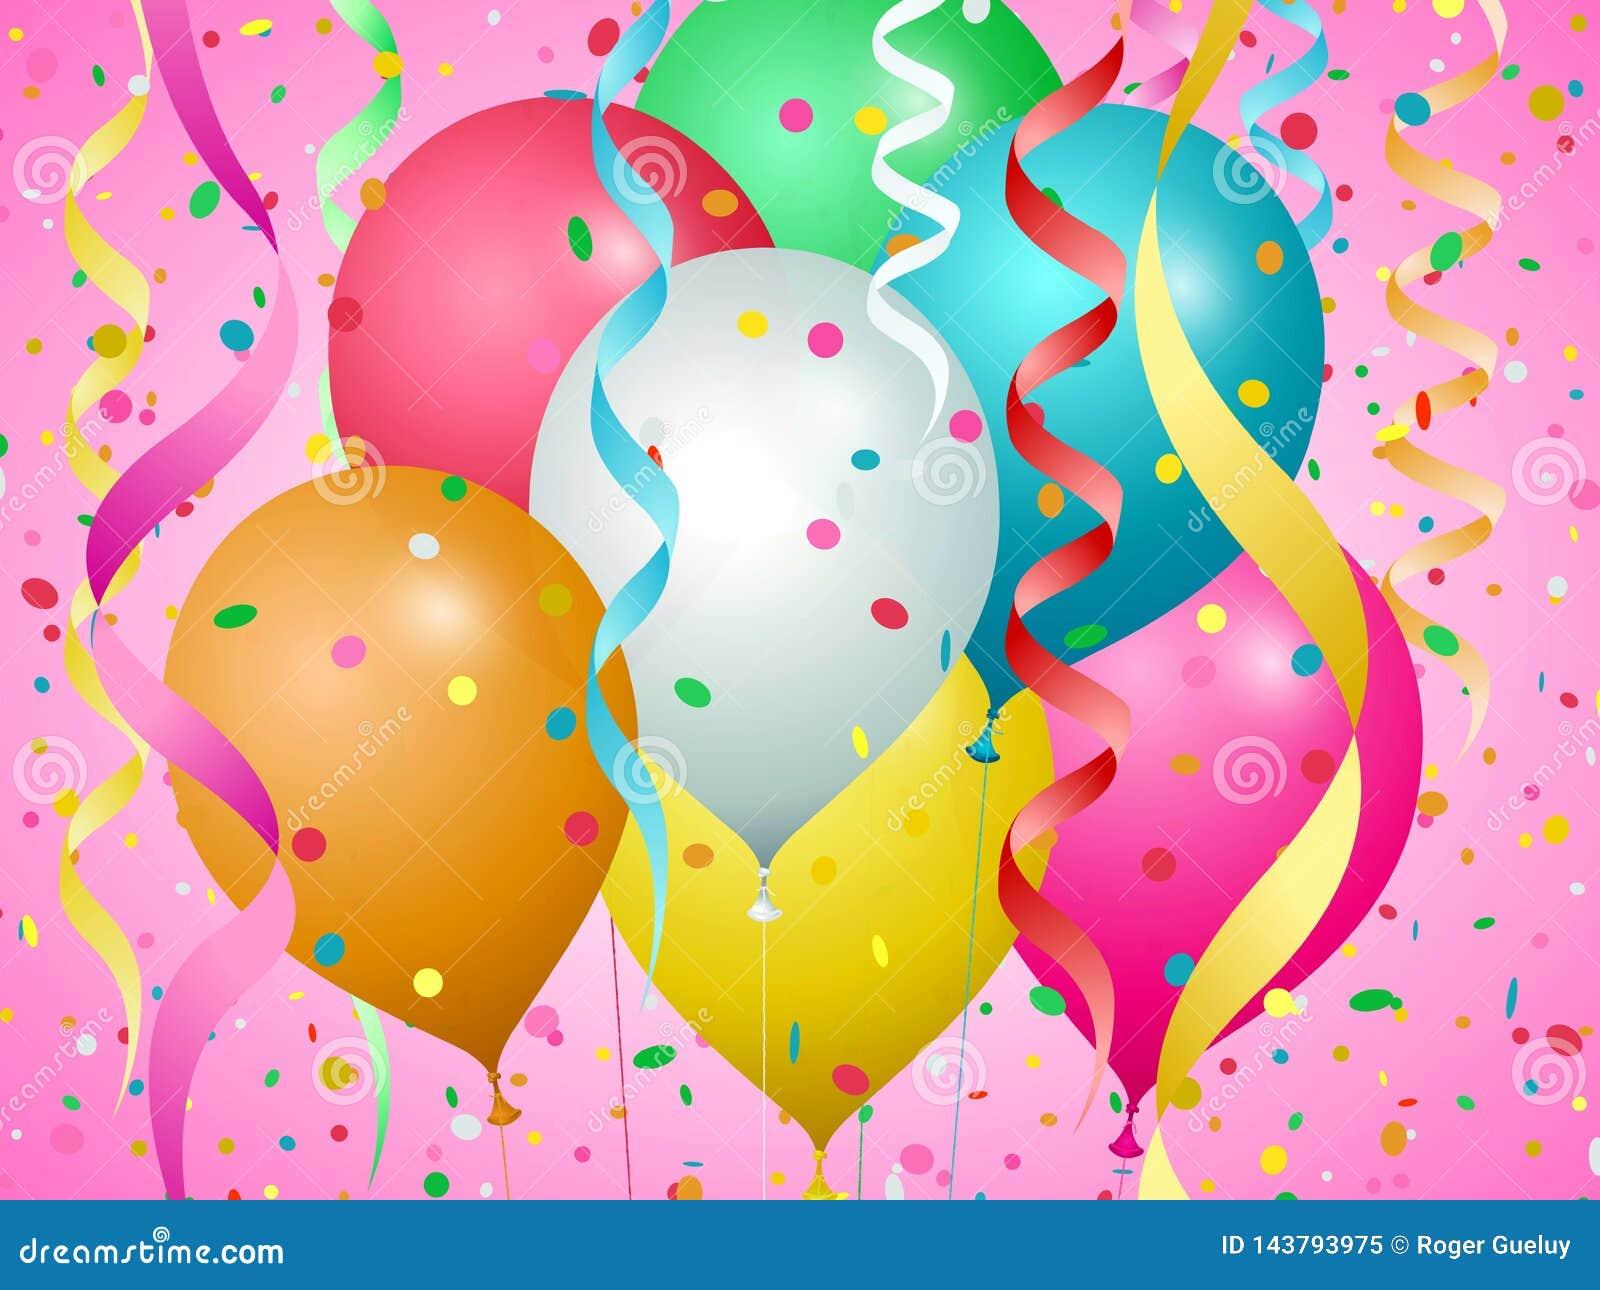 Balões, confetes e flâmulas de cores diferentes